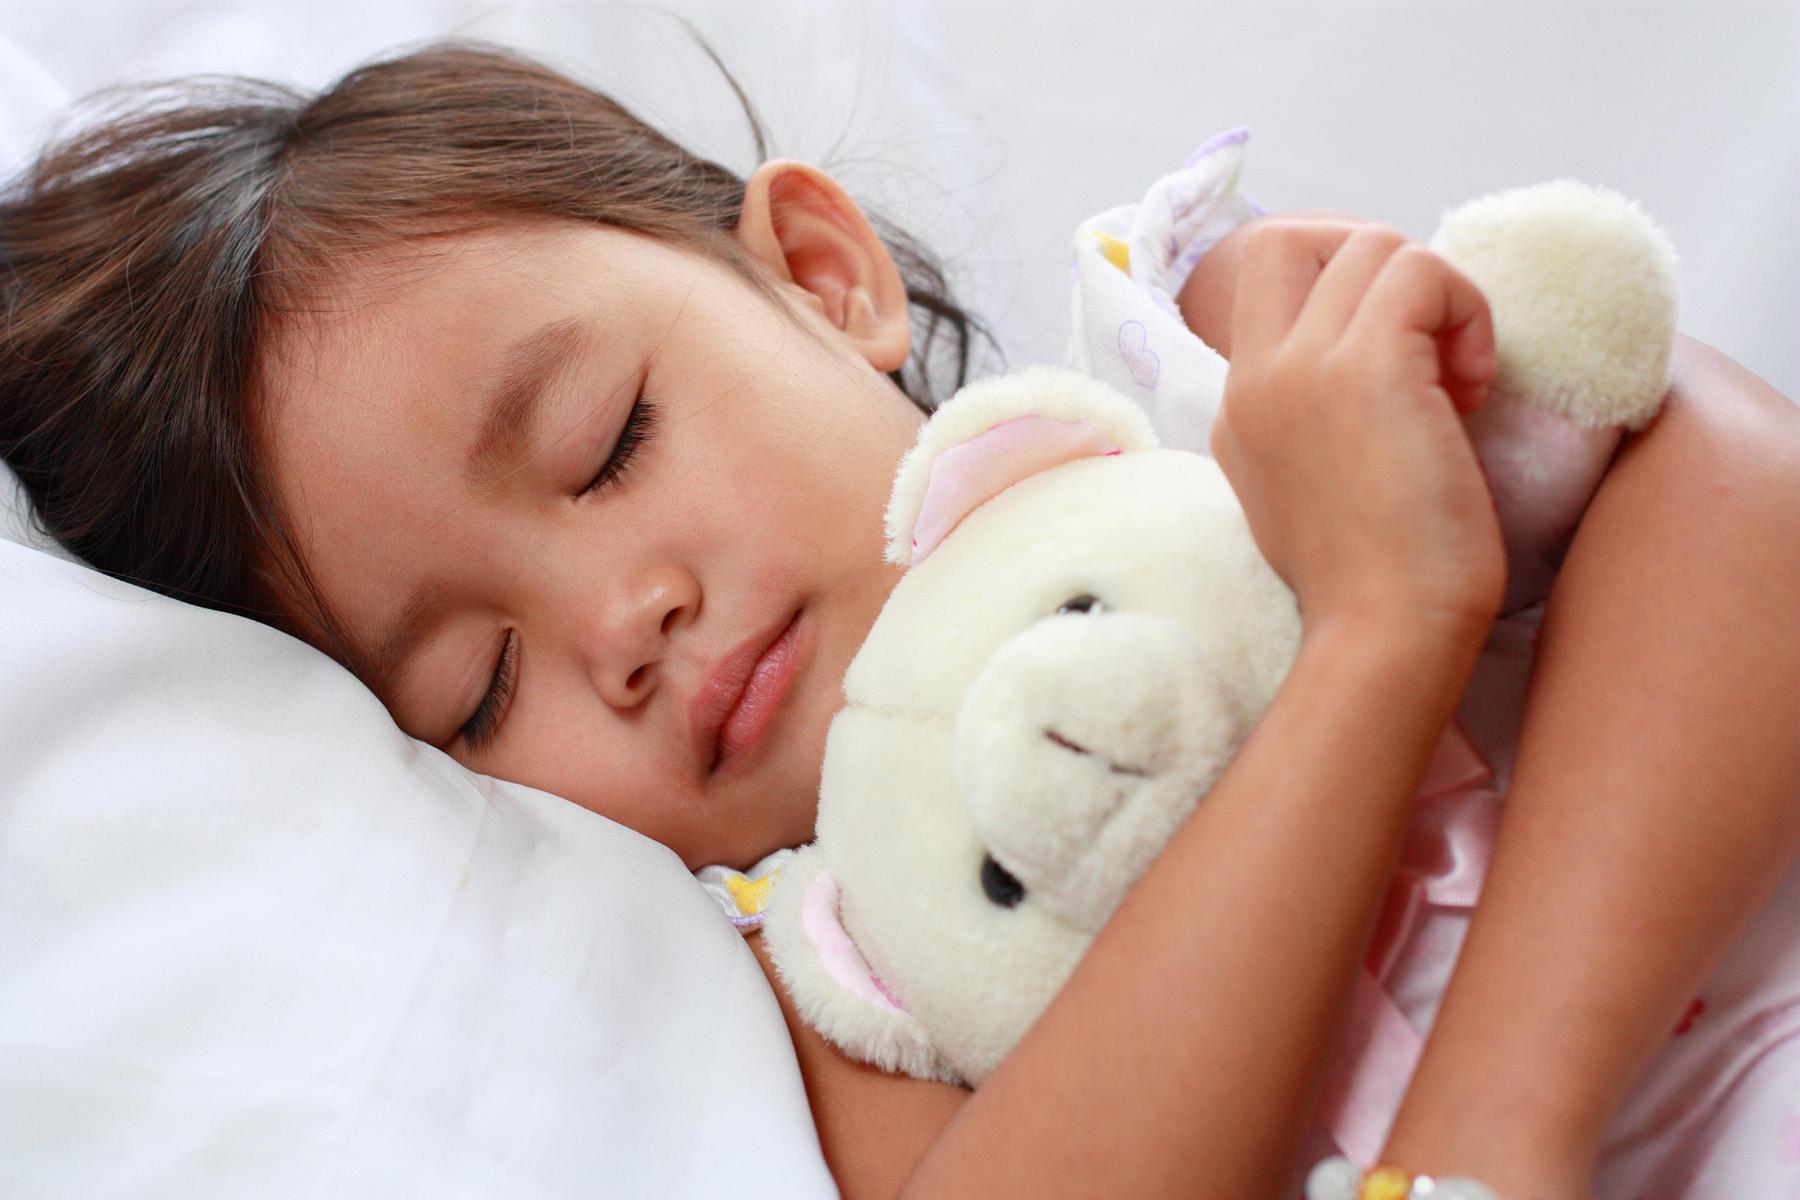 Too little sleep in preschool could mean behavior problems